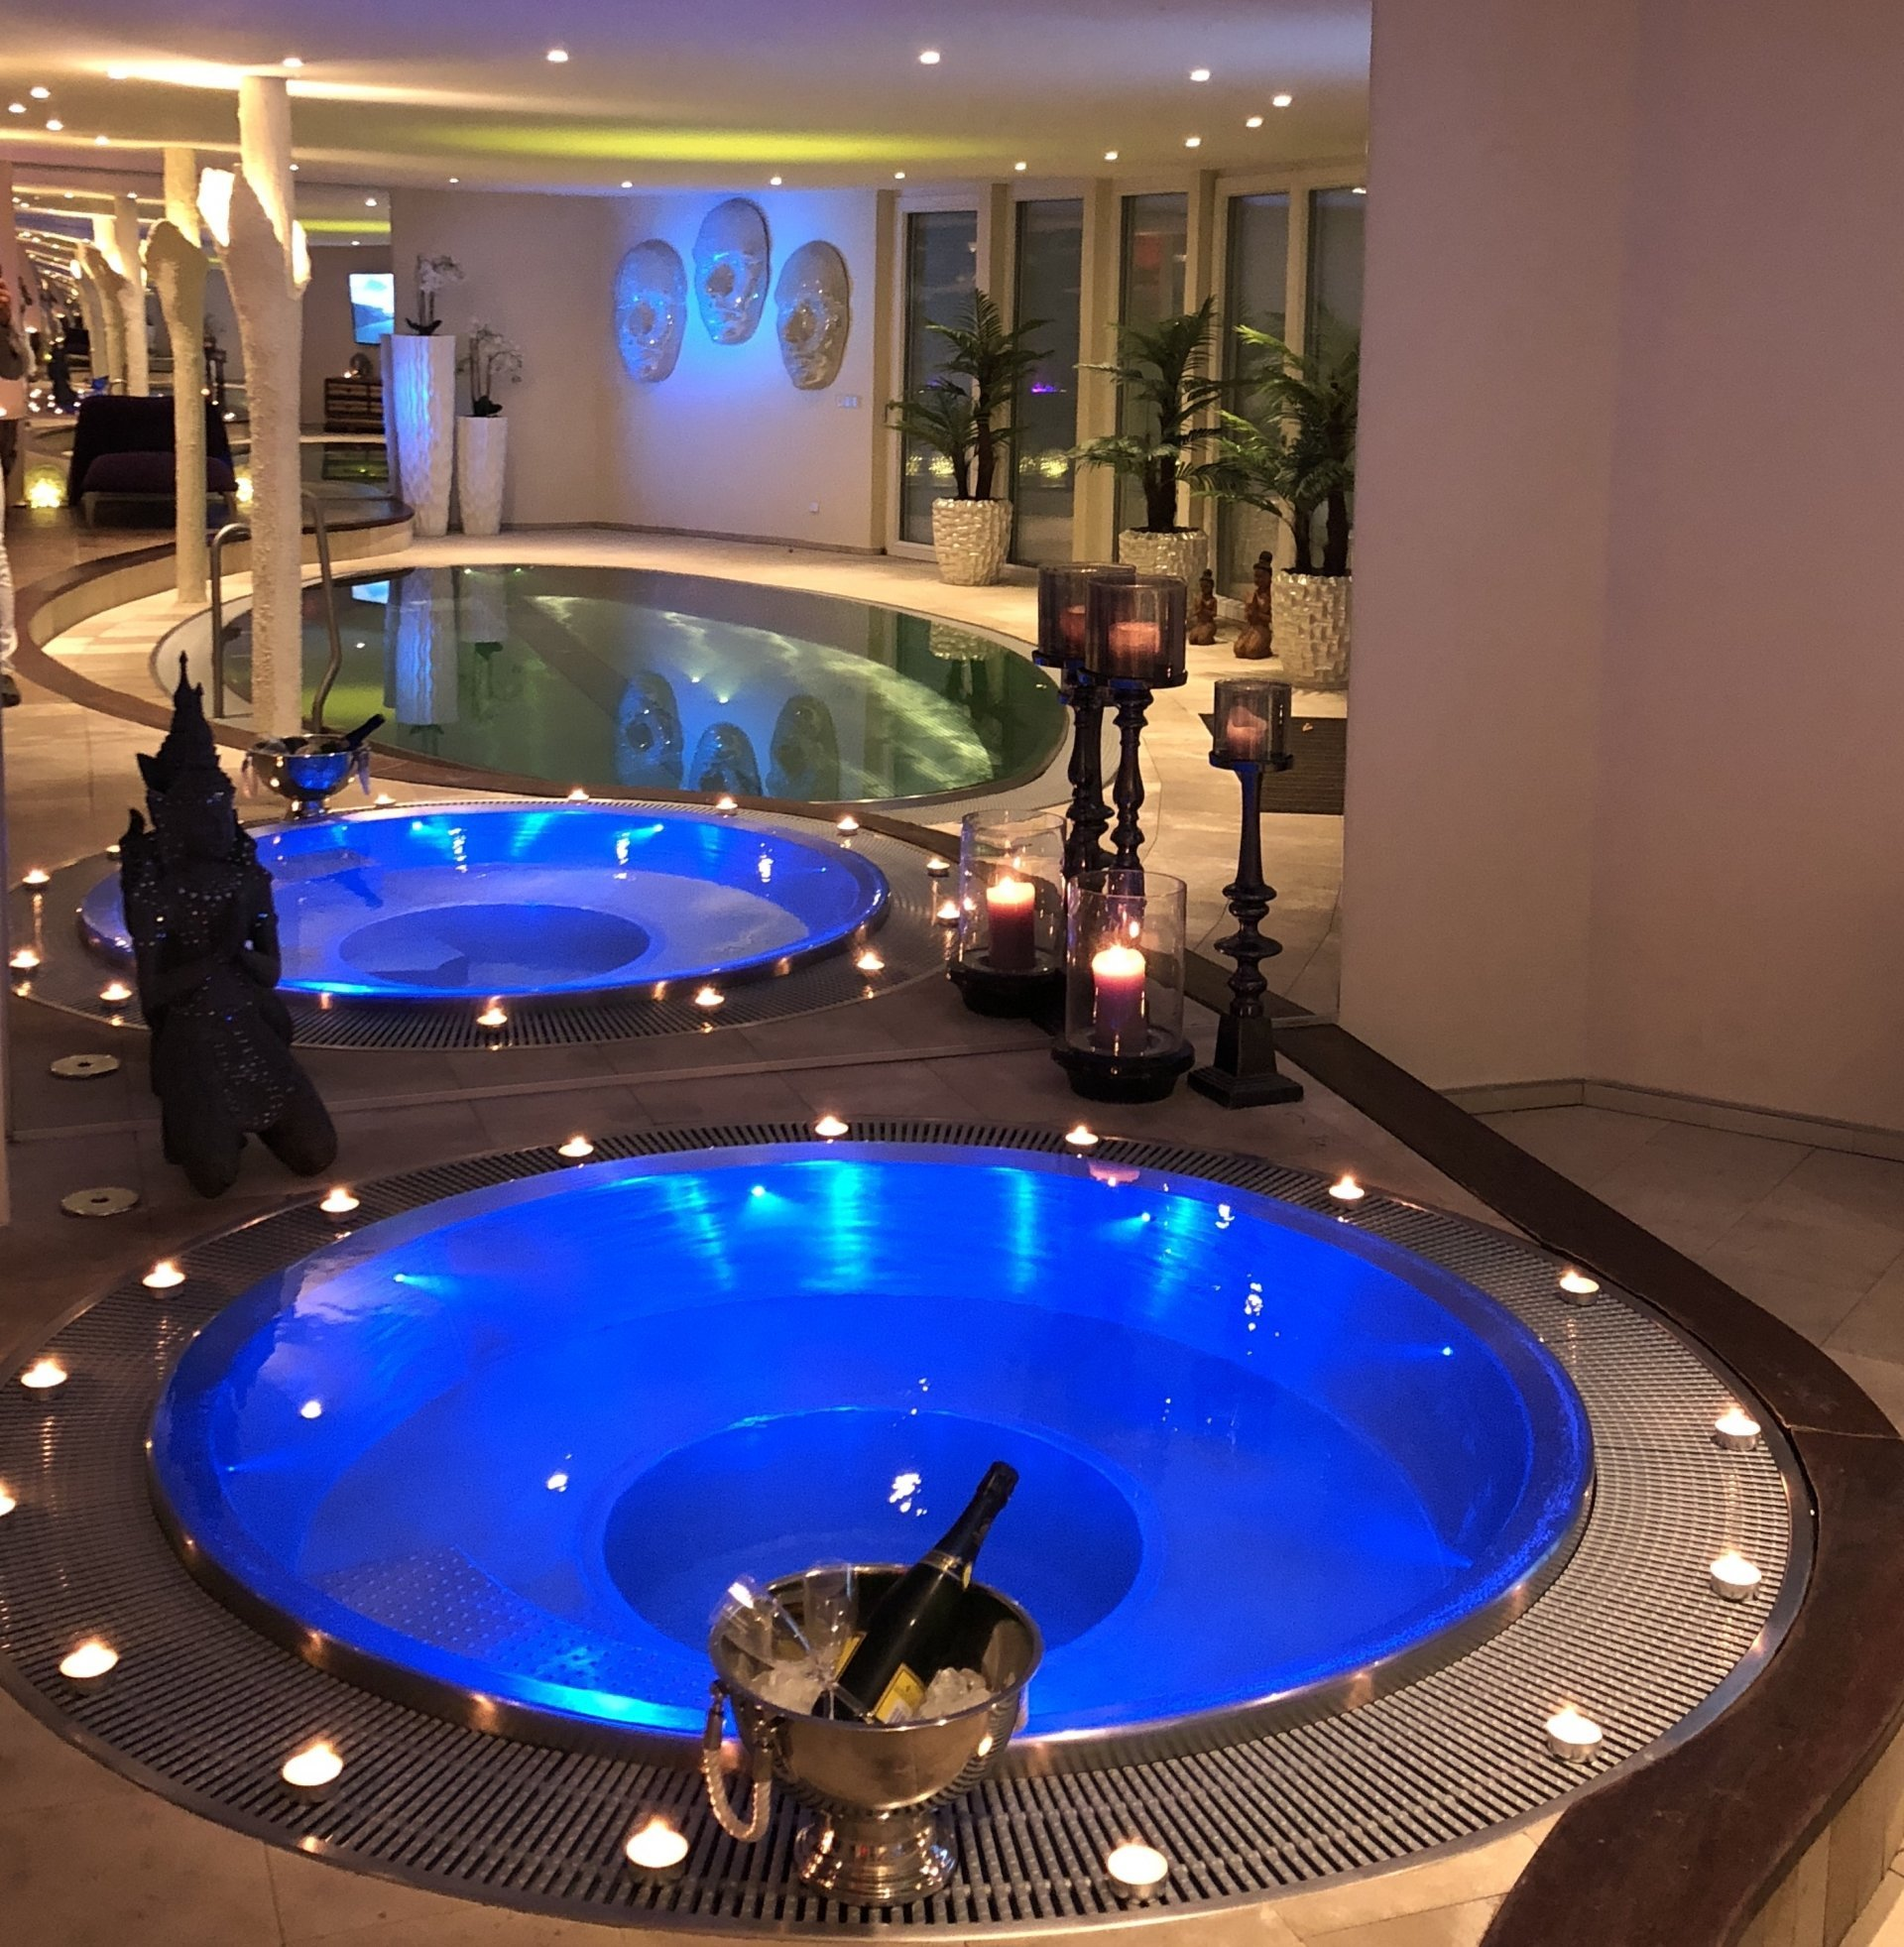 private spa mit bernachtung in deluxe zimmer in stuttgart im luxfit spa in stuttgart. Black Bedroom Furniture Sets. Home Design Ideas